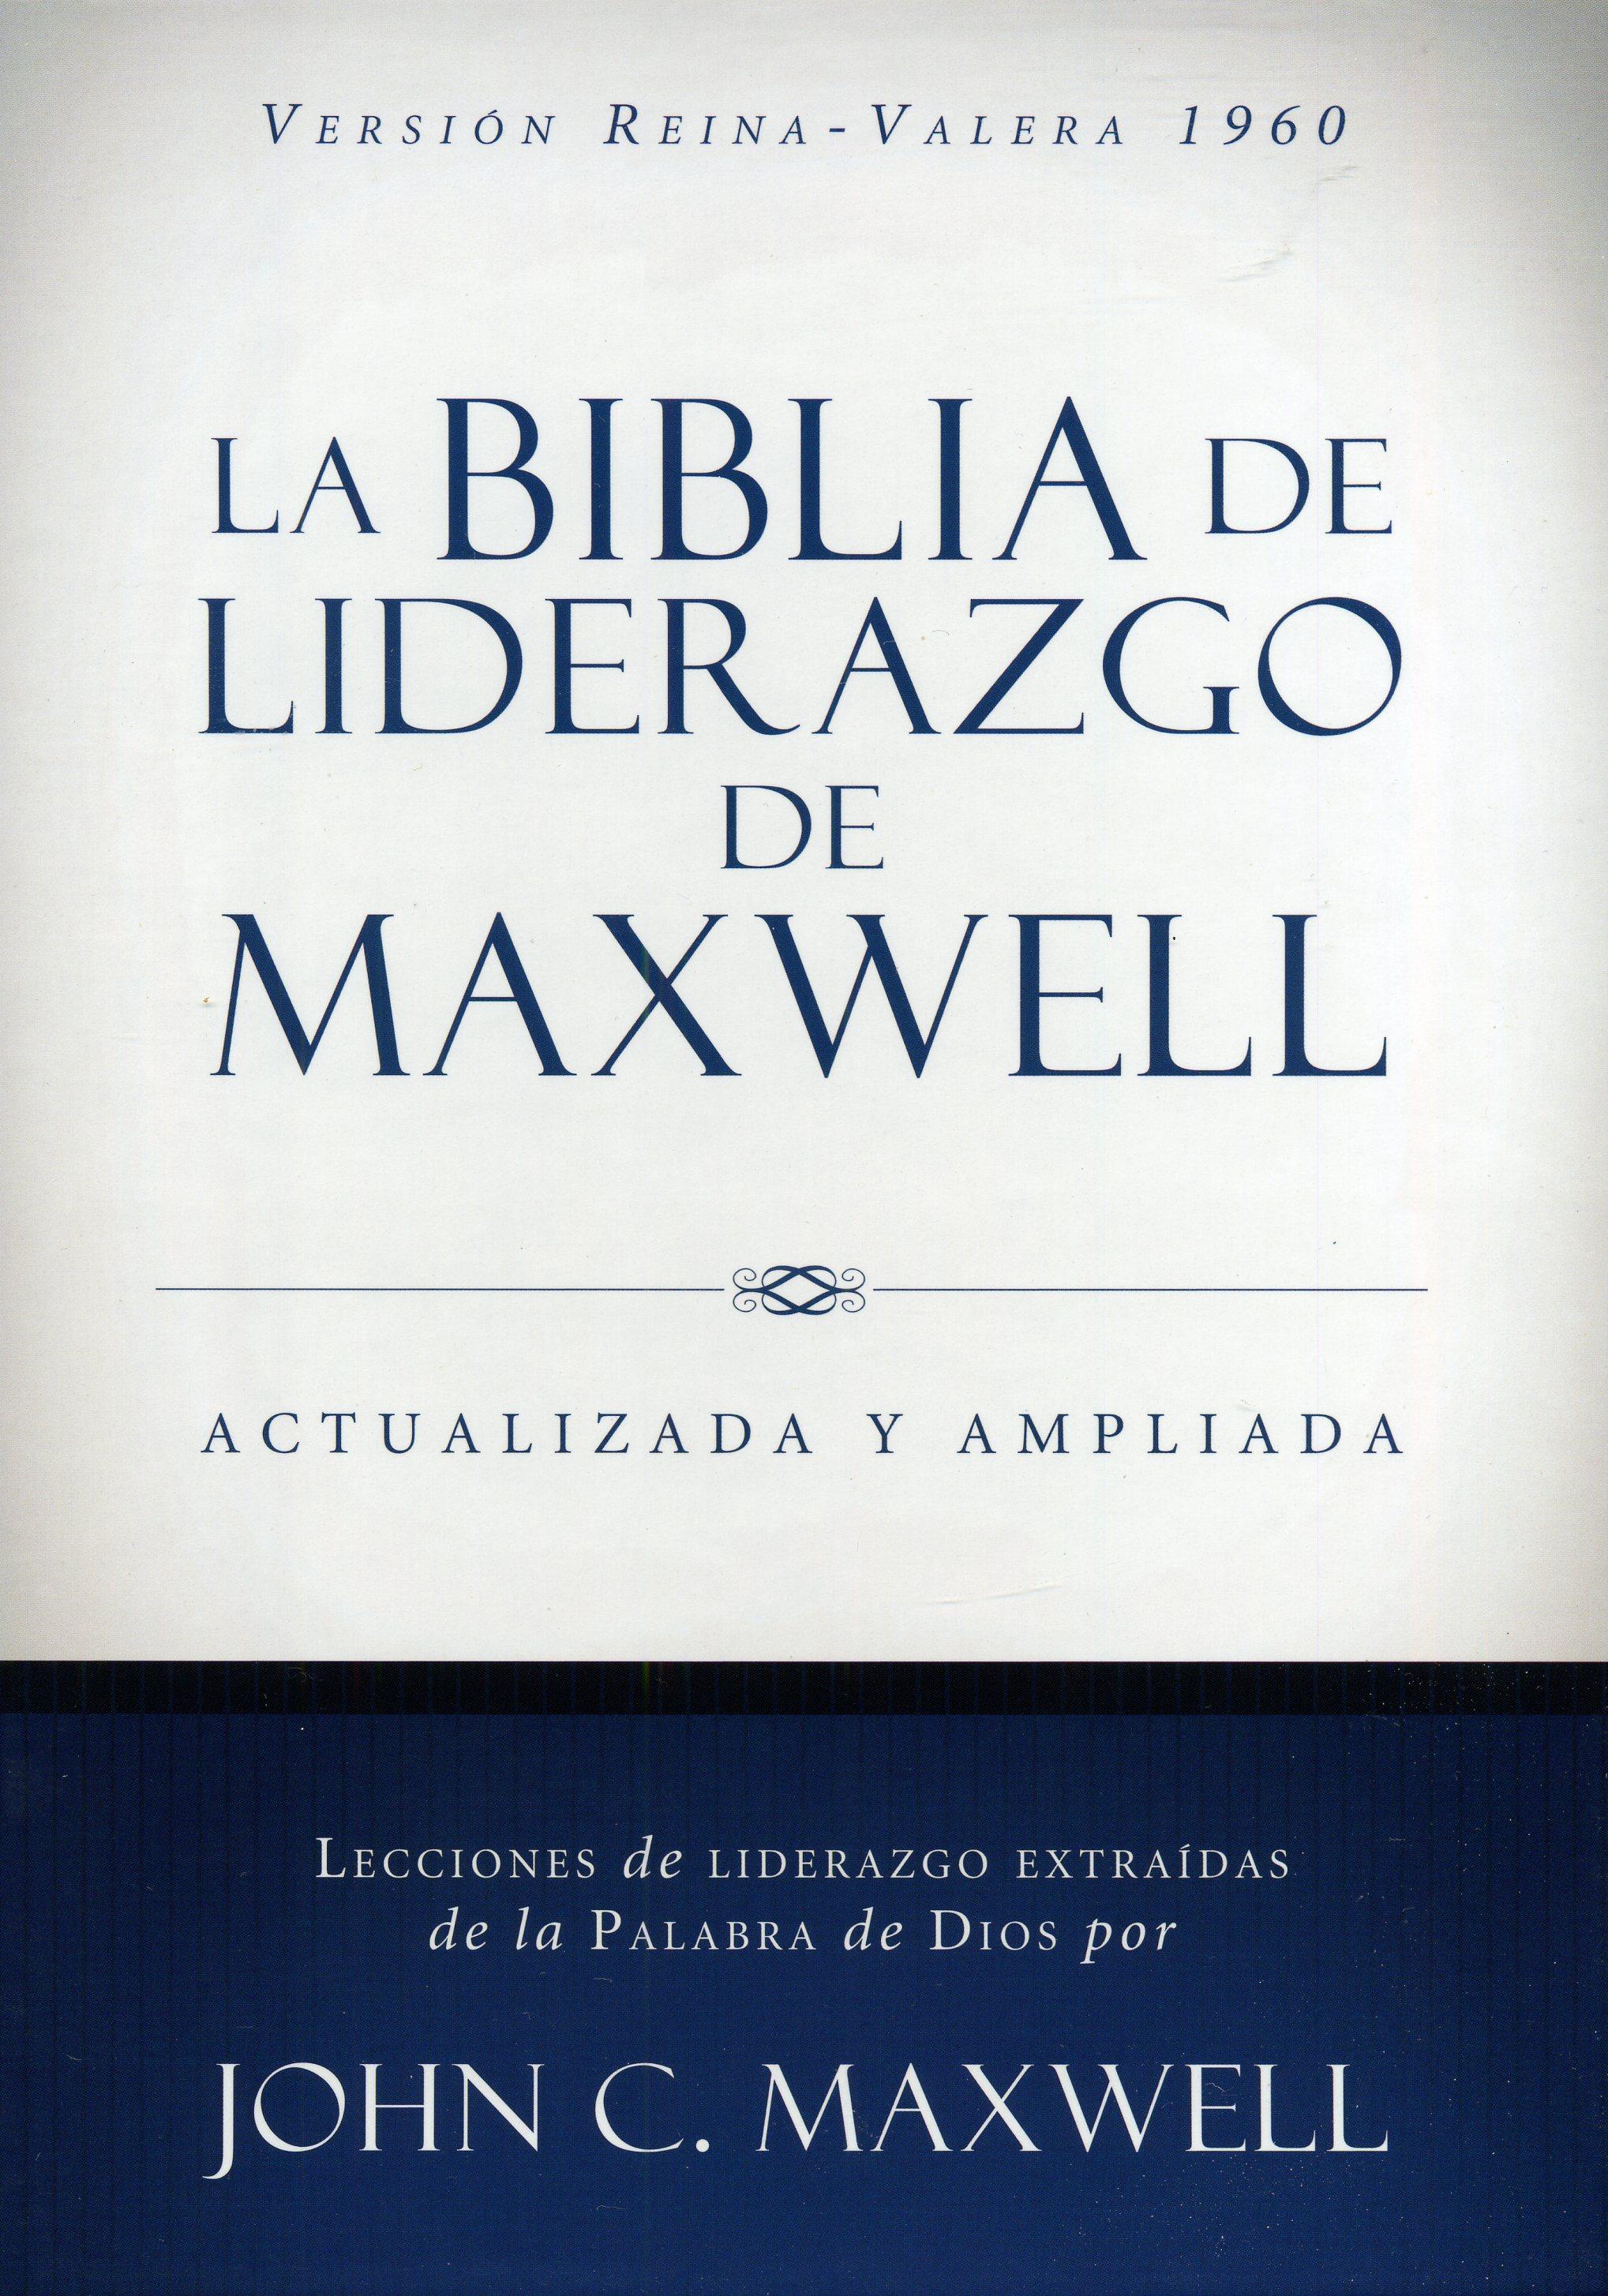 Biblia De Liderazgo De Maxwell Actualizada Y Ampliada 9780718037109 John C Maxwell Autor Clc Panama